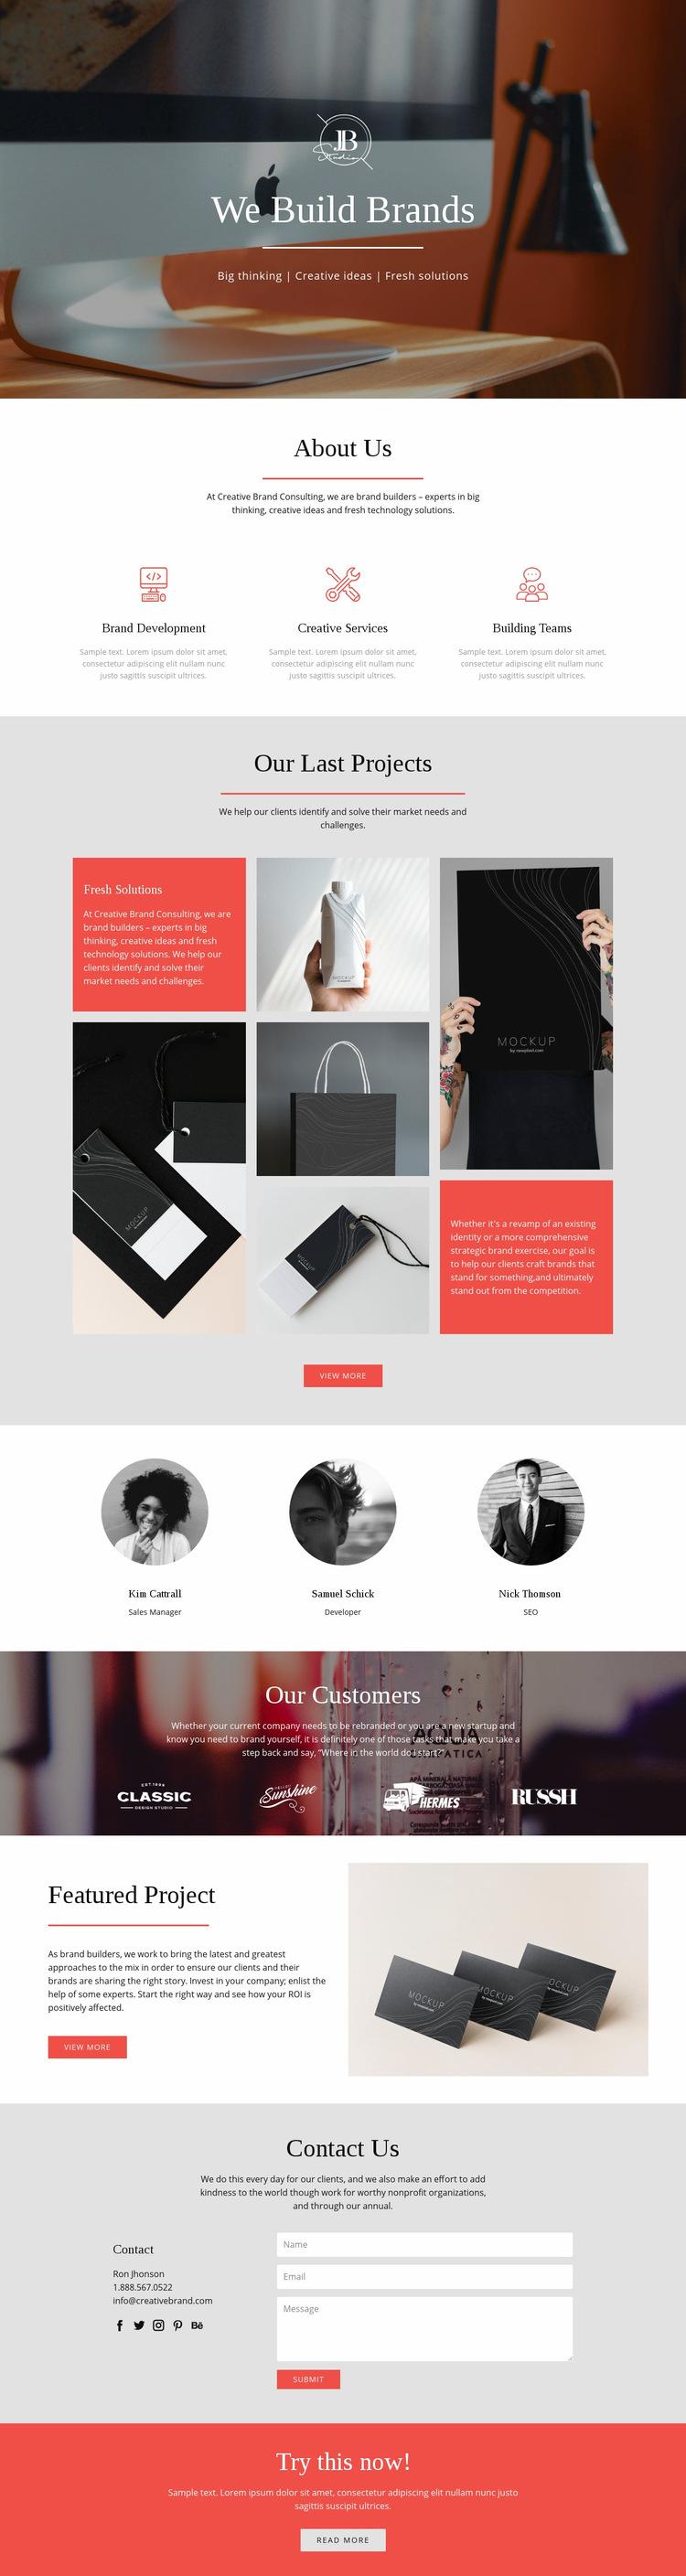 We build brands Web Page Design